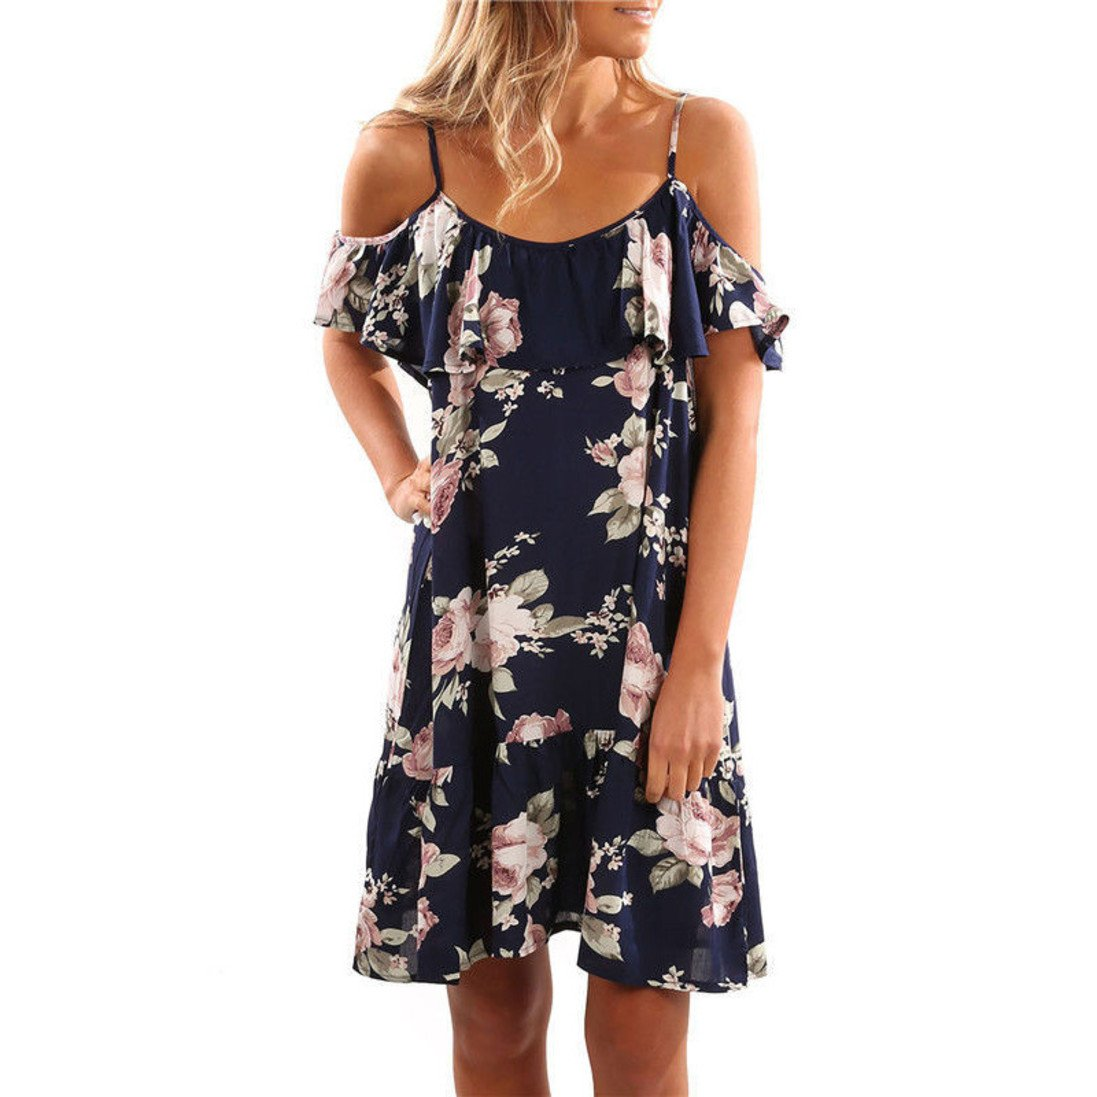 bluee Yeyemet Womens Floral Cold Shoulder Adjustable Spaghetti Strap Midi Dress